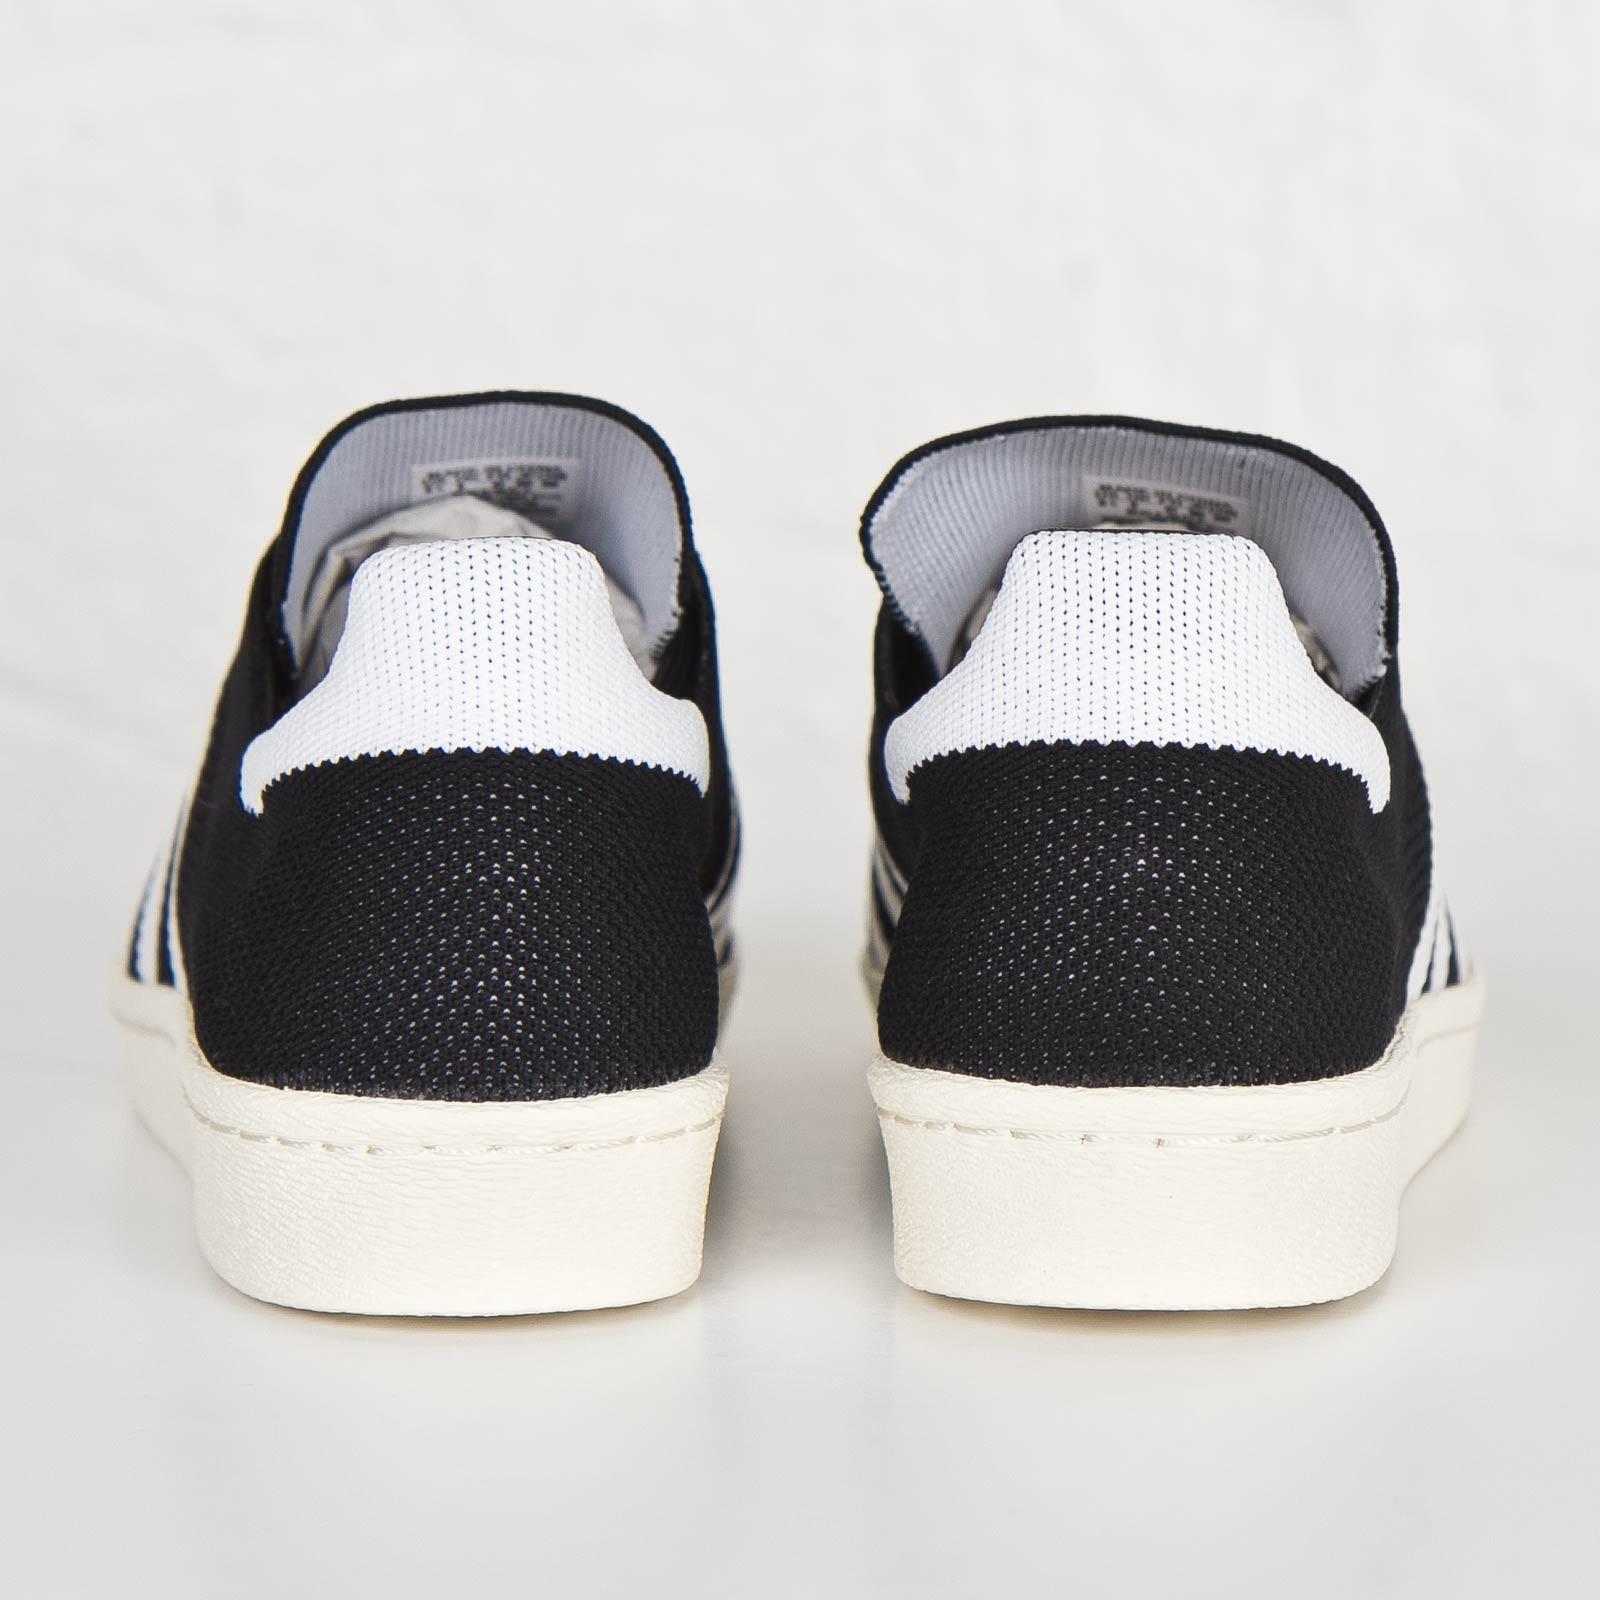 Adidas Originals Superstar 80s Primeknit BLACK WHITE GOLD